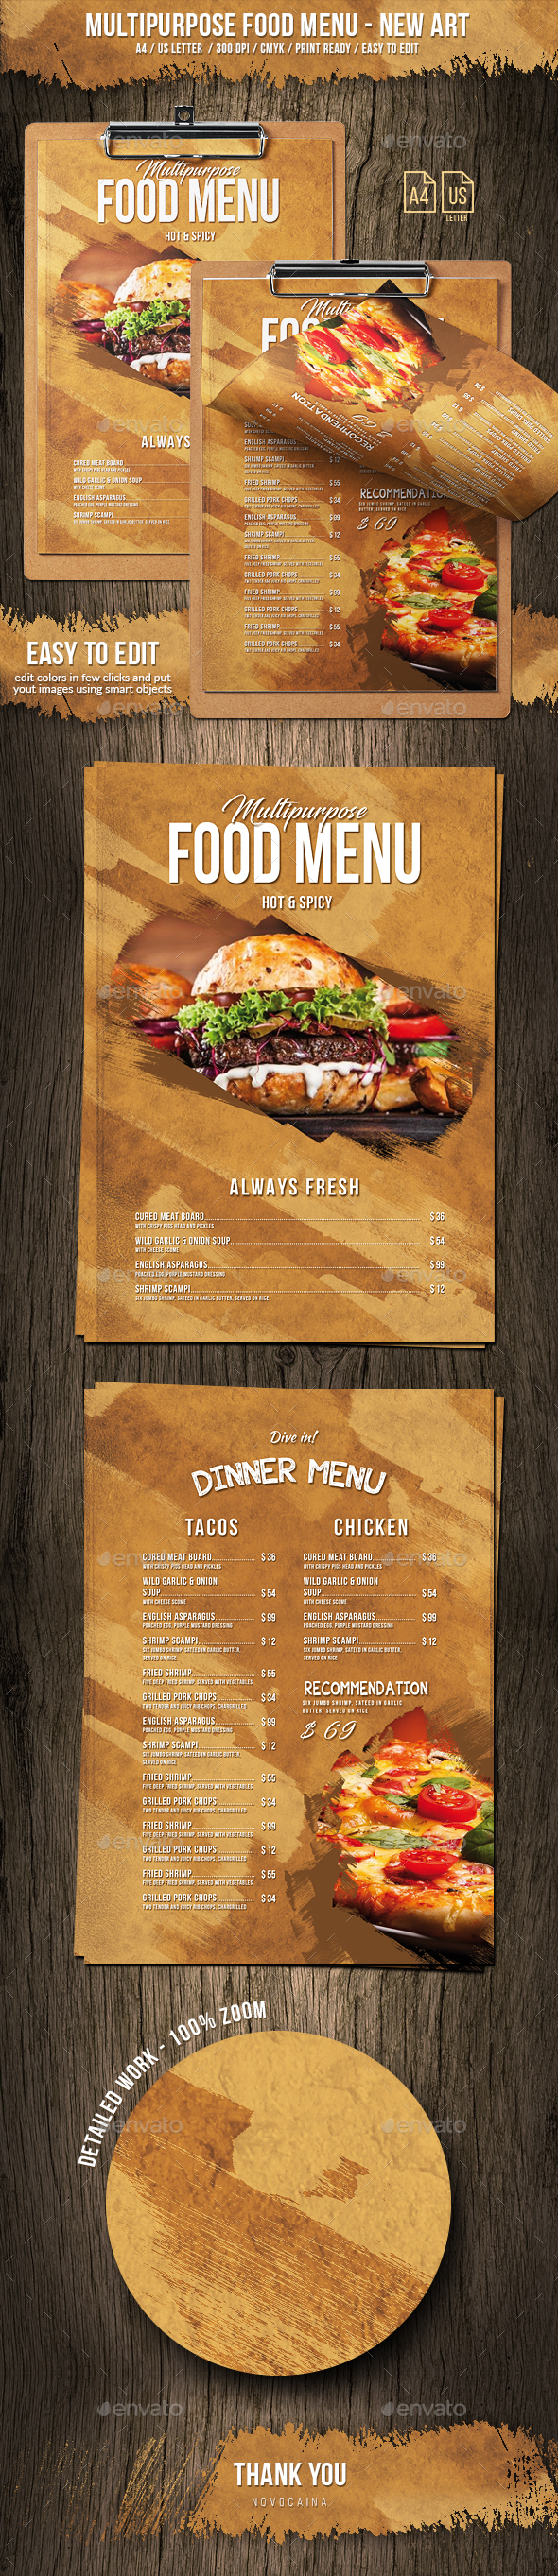 Multipurpose Food Menu - New Art - A4 & US Letter - Food Menus Print Templates